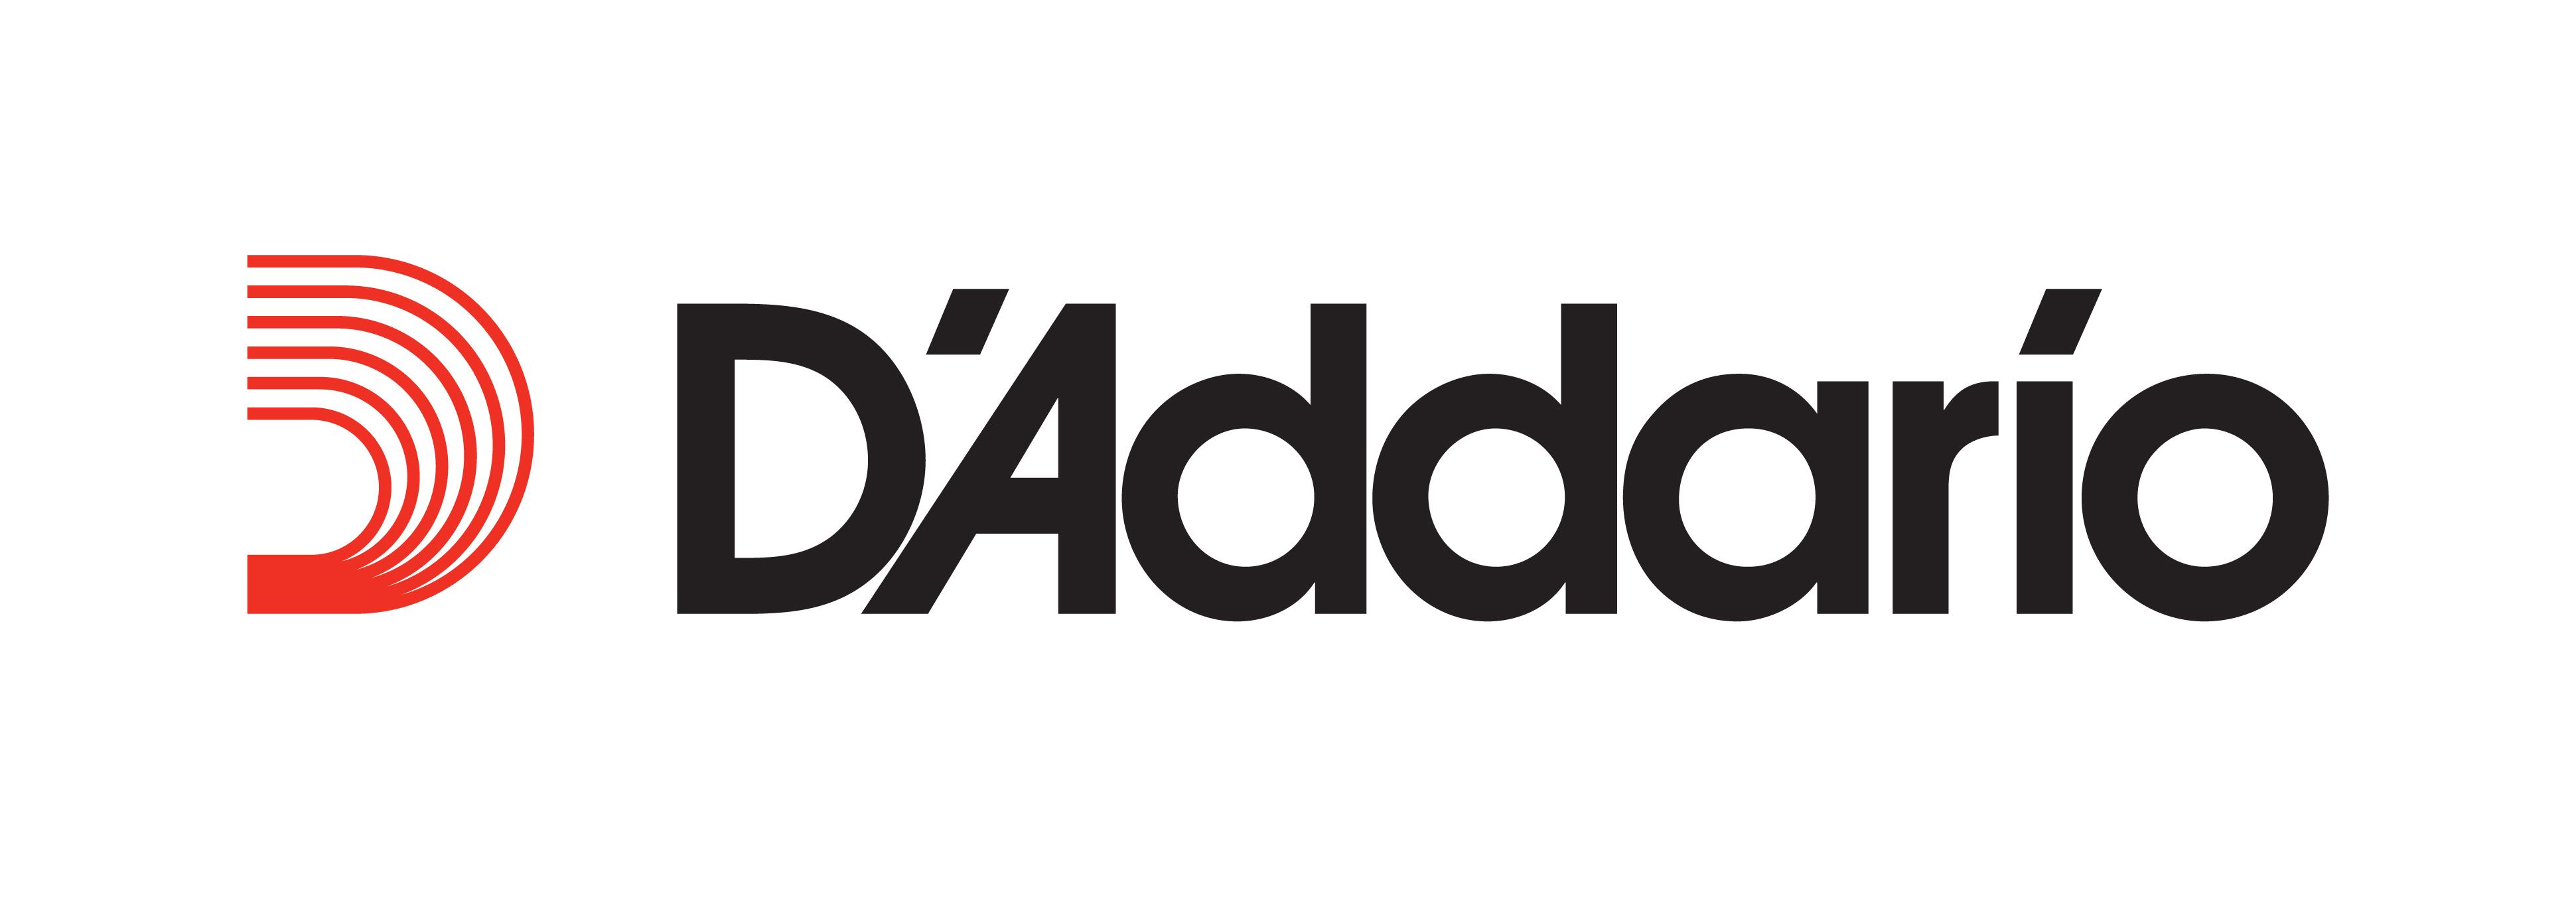 daddario-logo-black.jpg